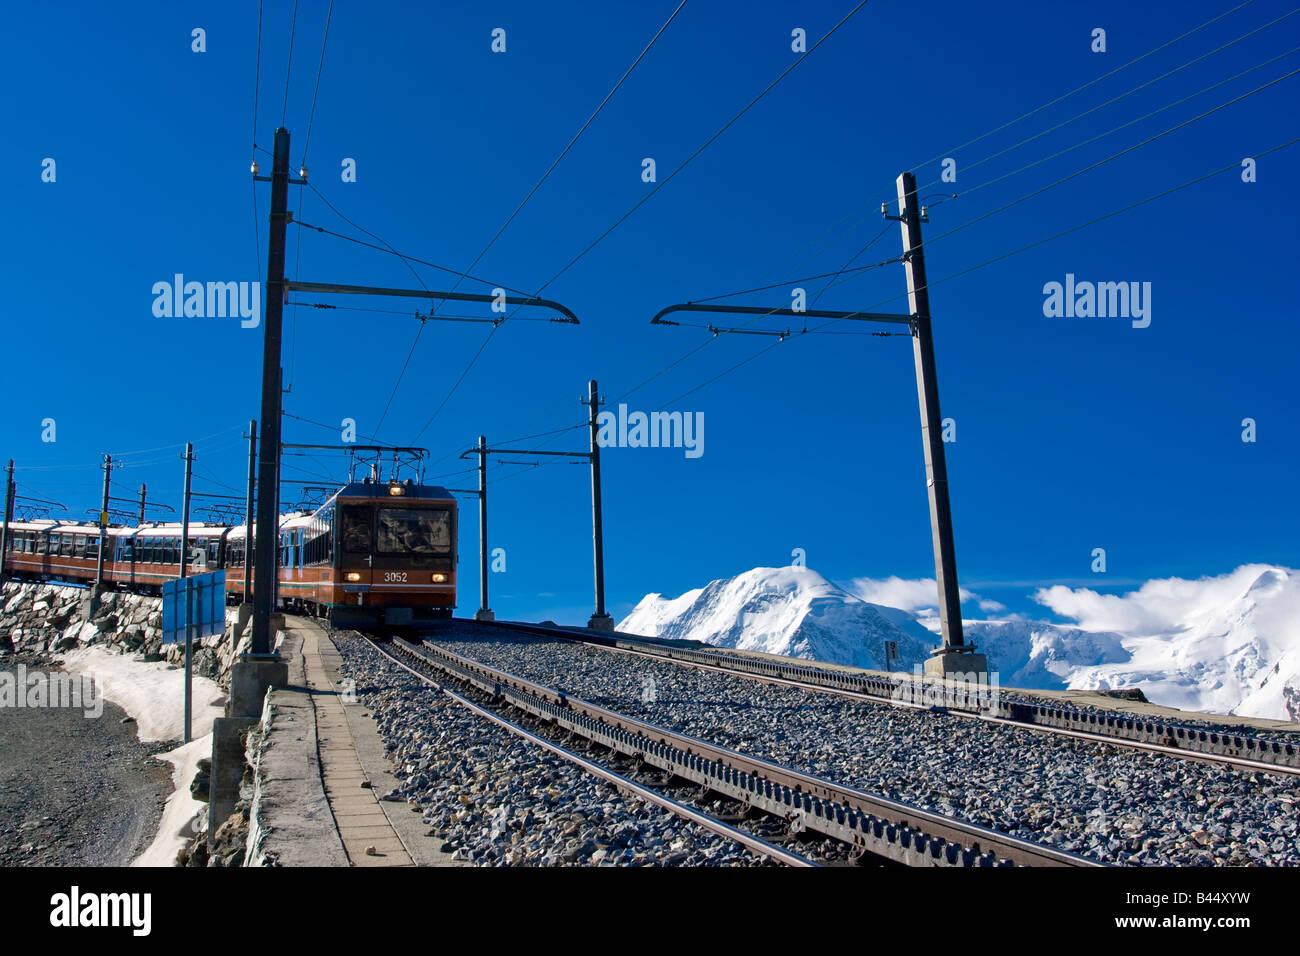 Gornergrat cogwheel Train on its way down, Zermatt - Stock Image